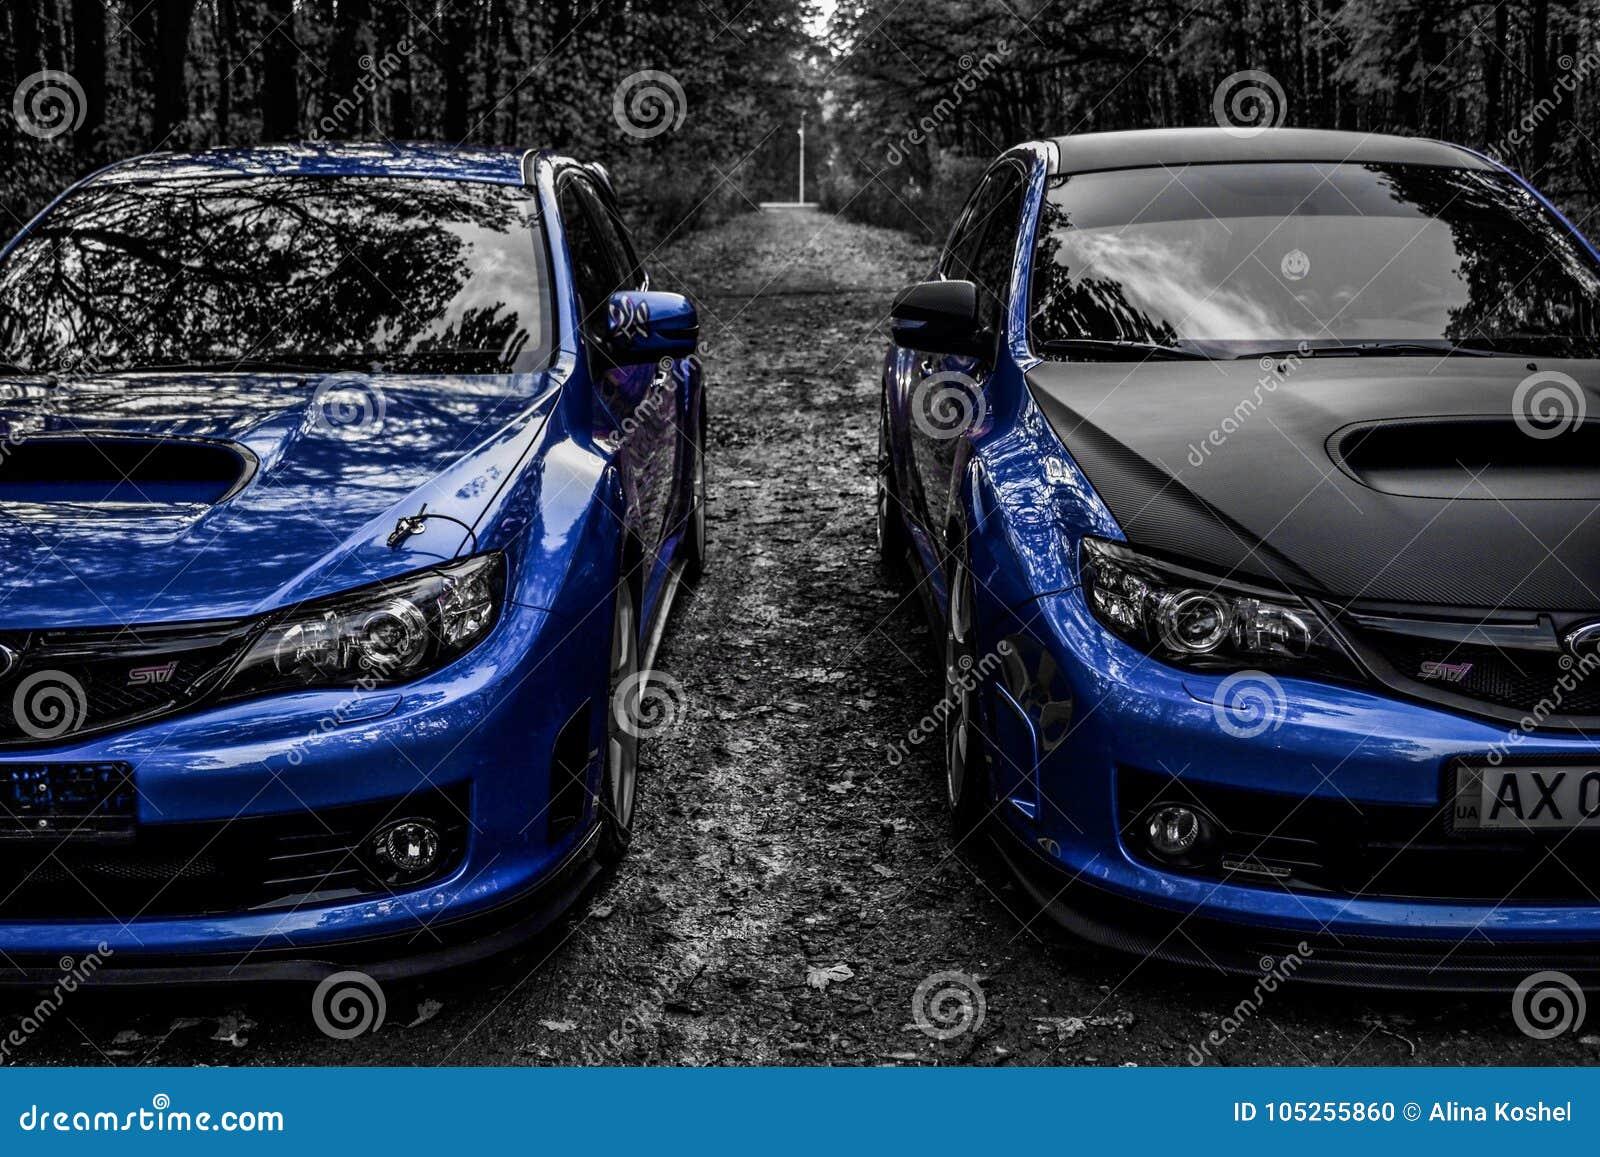 Subaru Impreza Wrx Sti Racecar Sport Car Editorial Image Image Of Impreza Sunlight 105255860